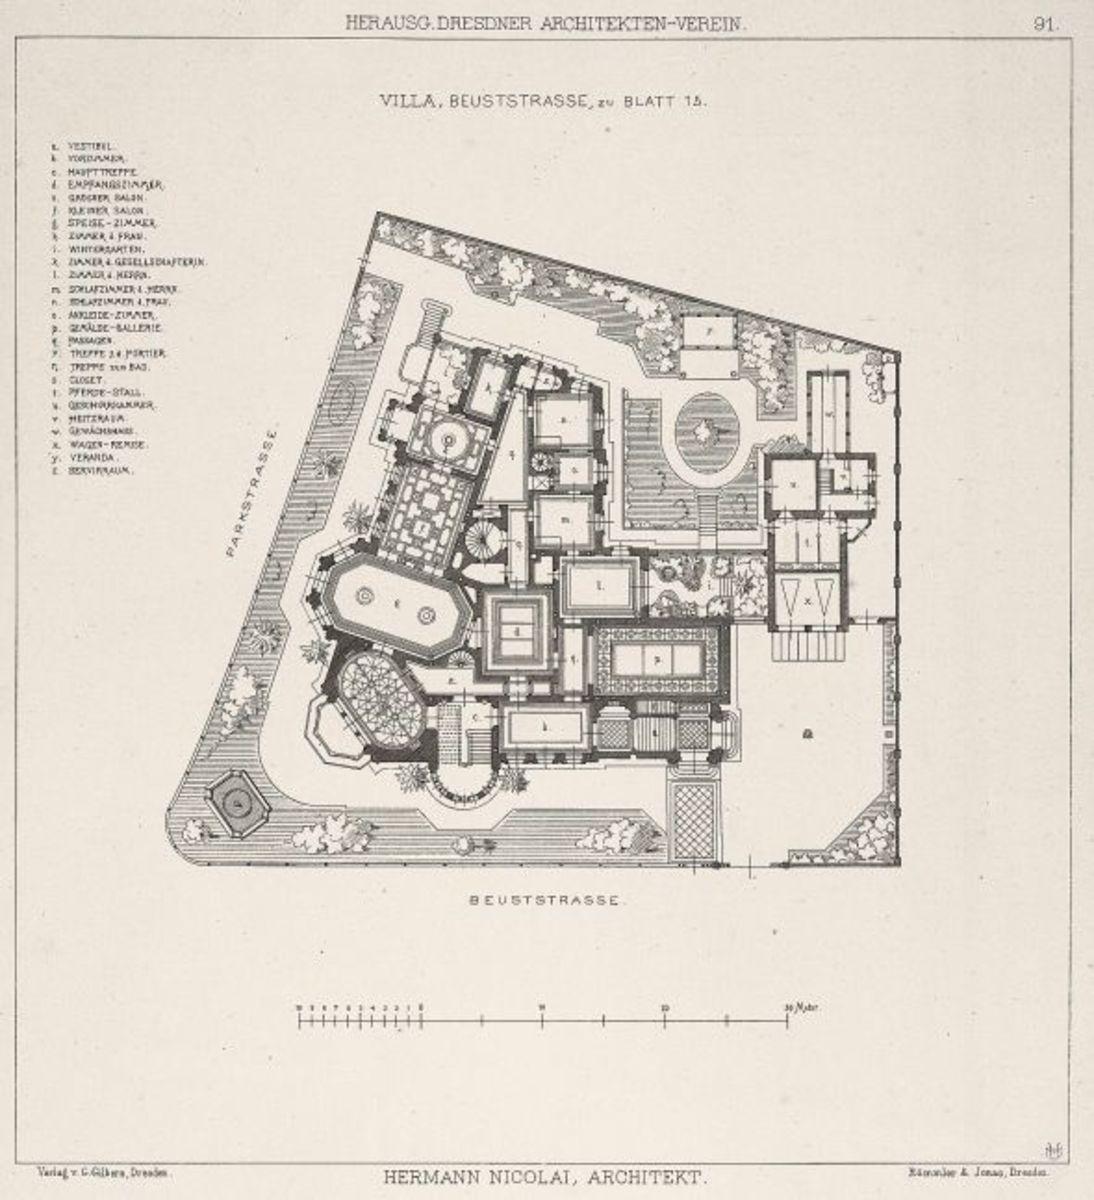 Plate # 51 Floor plan & list # for each room    Herman Nicolai Architekt